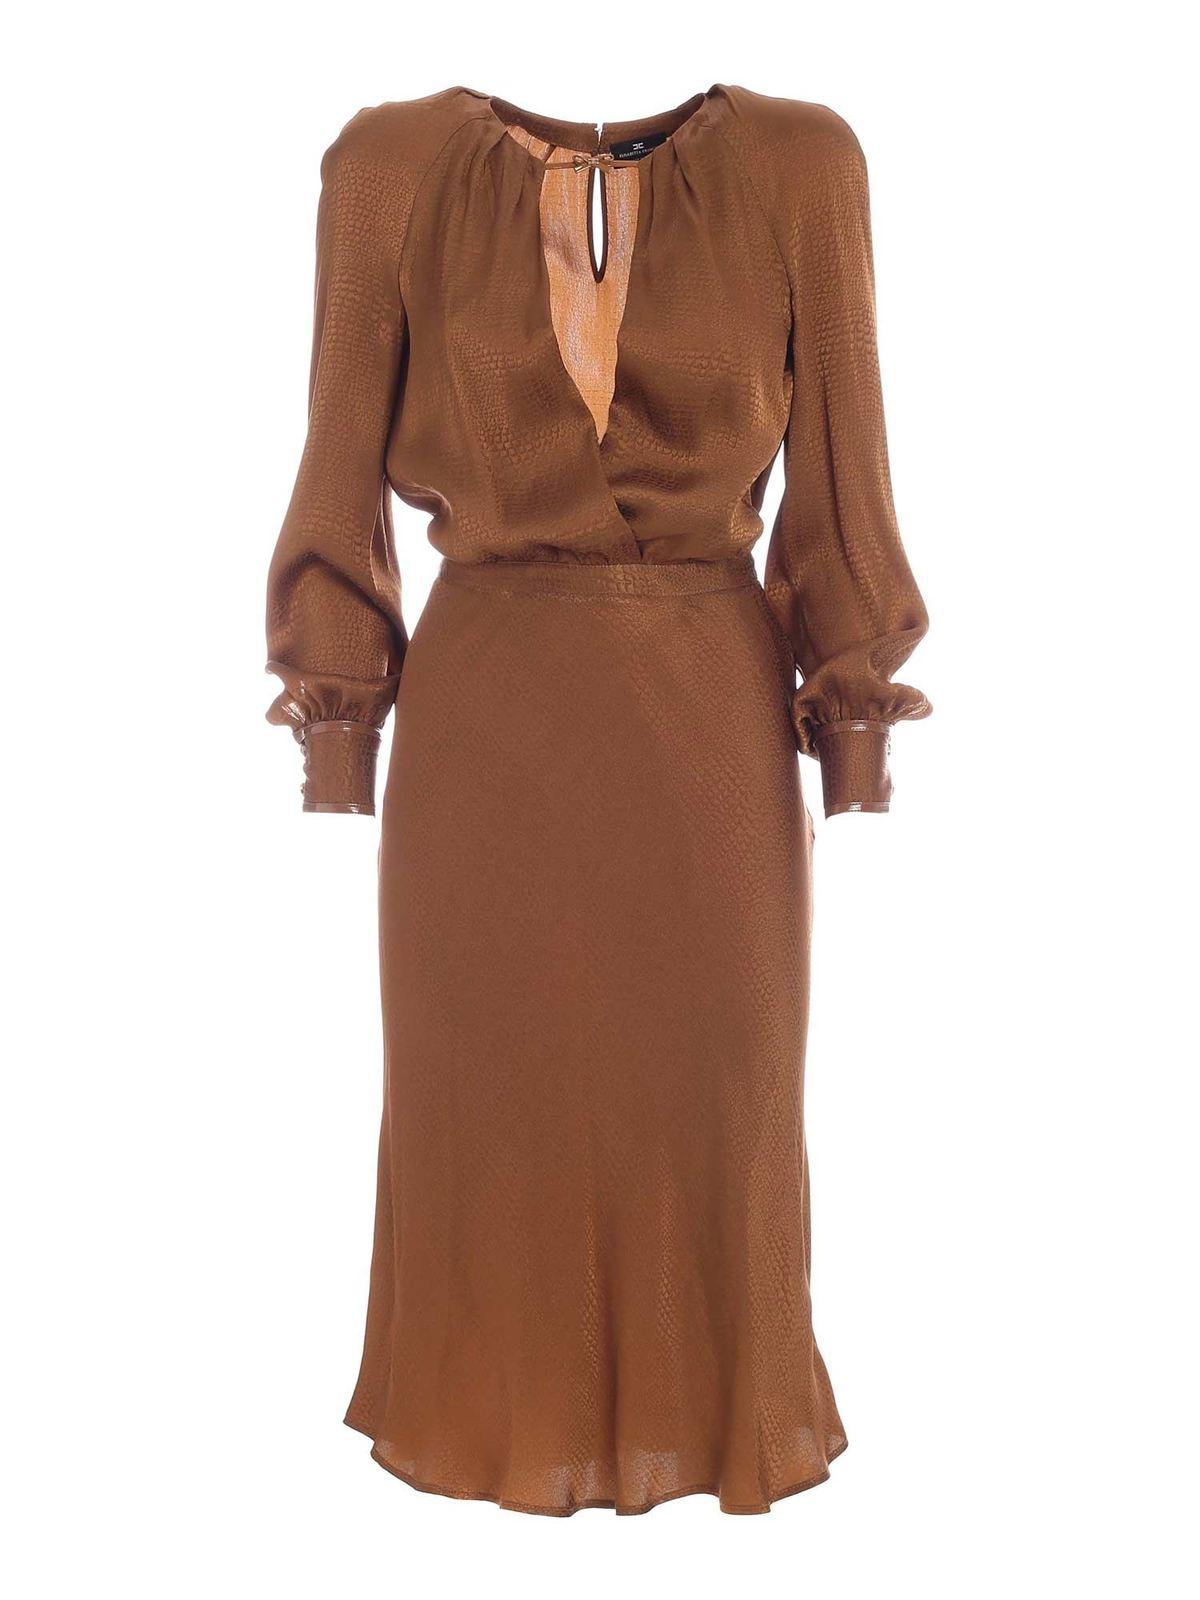 Elisabetta Franchi REPTILE PRINT RAGLAN SLEEVES DRESS IN BROWN